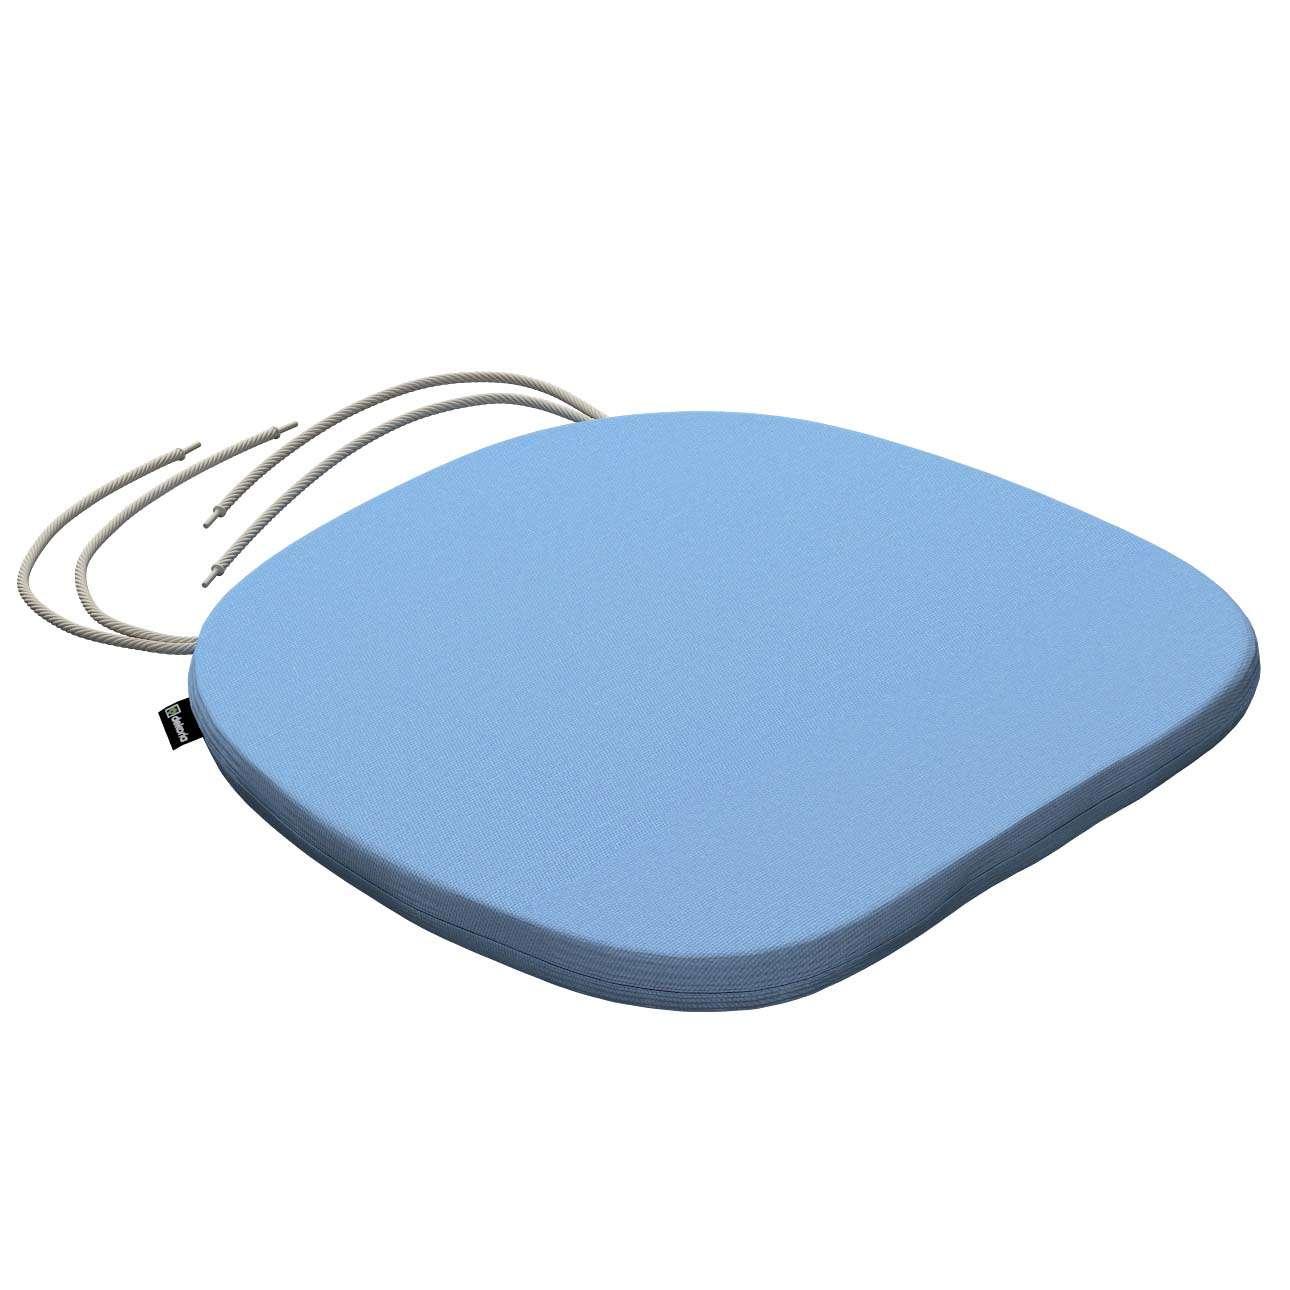 Kėdės pagalvėlė Bartek  40 x 37 x 2,5 cm kolekcijoje Loneta , audinys: 133-21